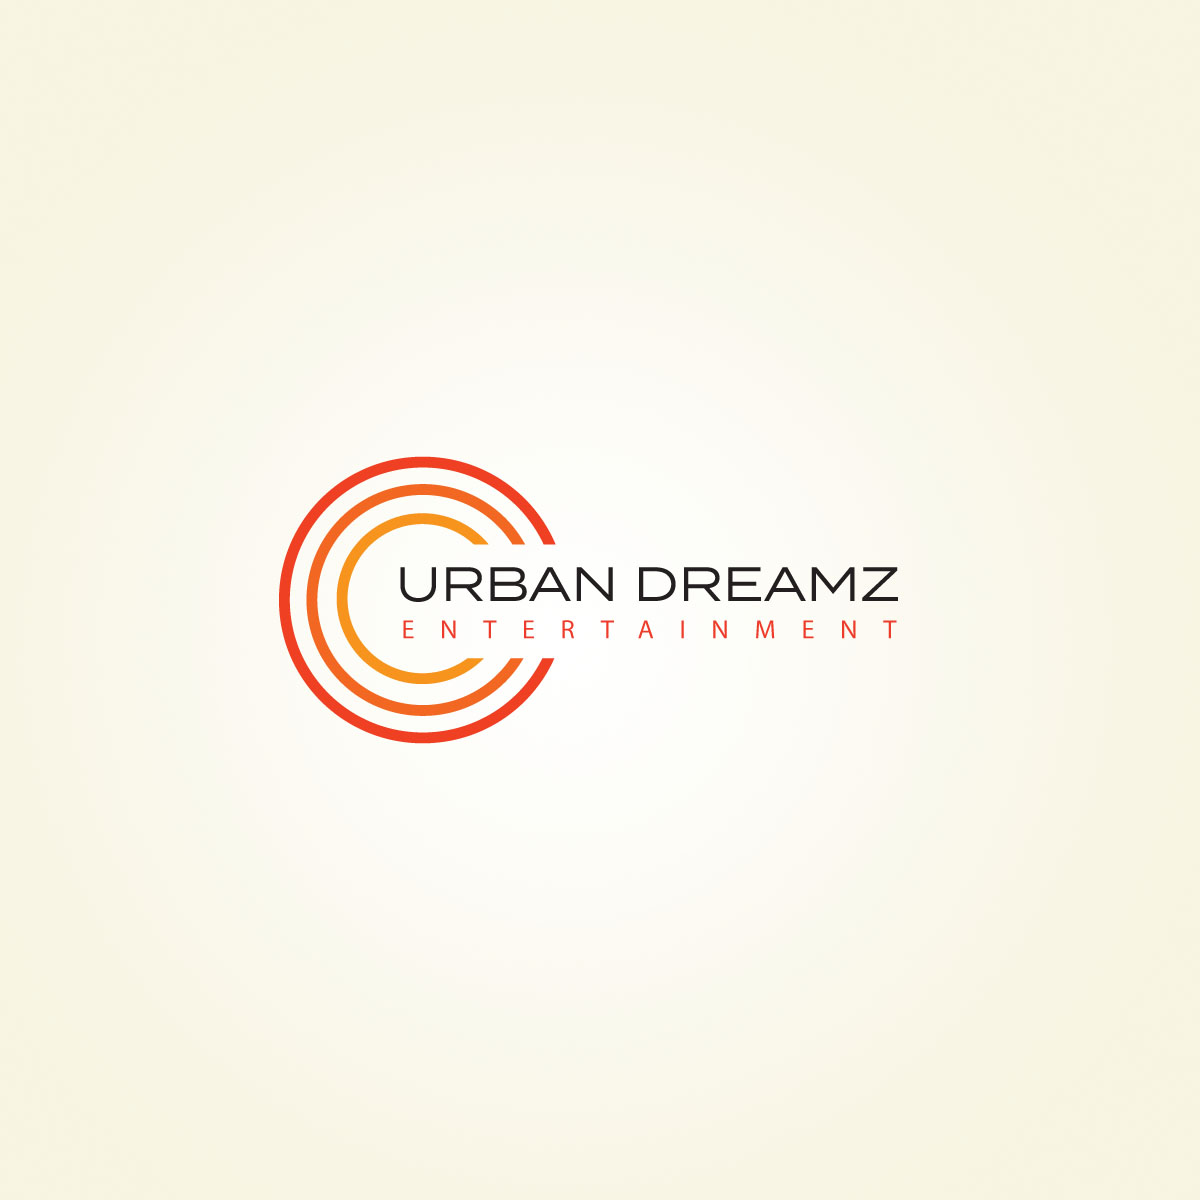 Urban Dreamz